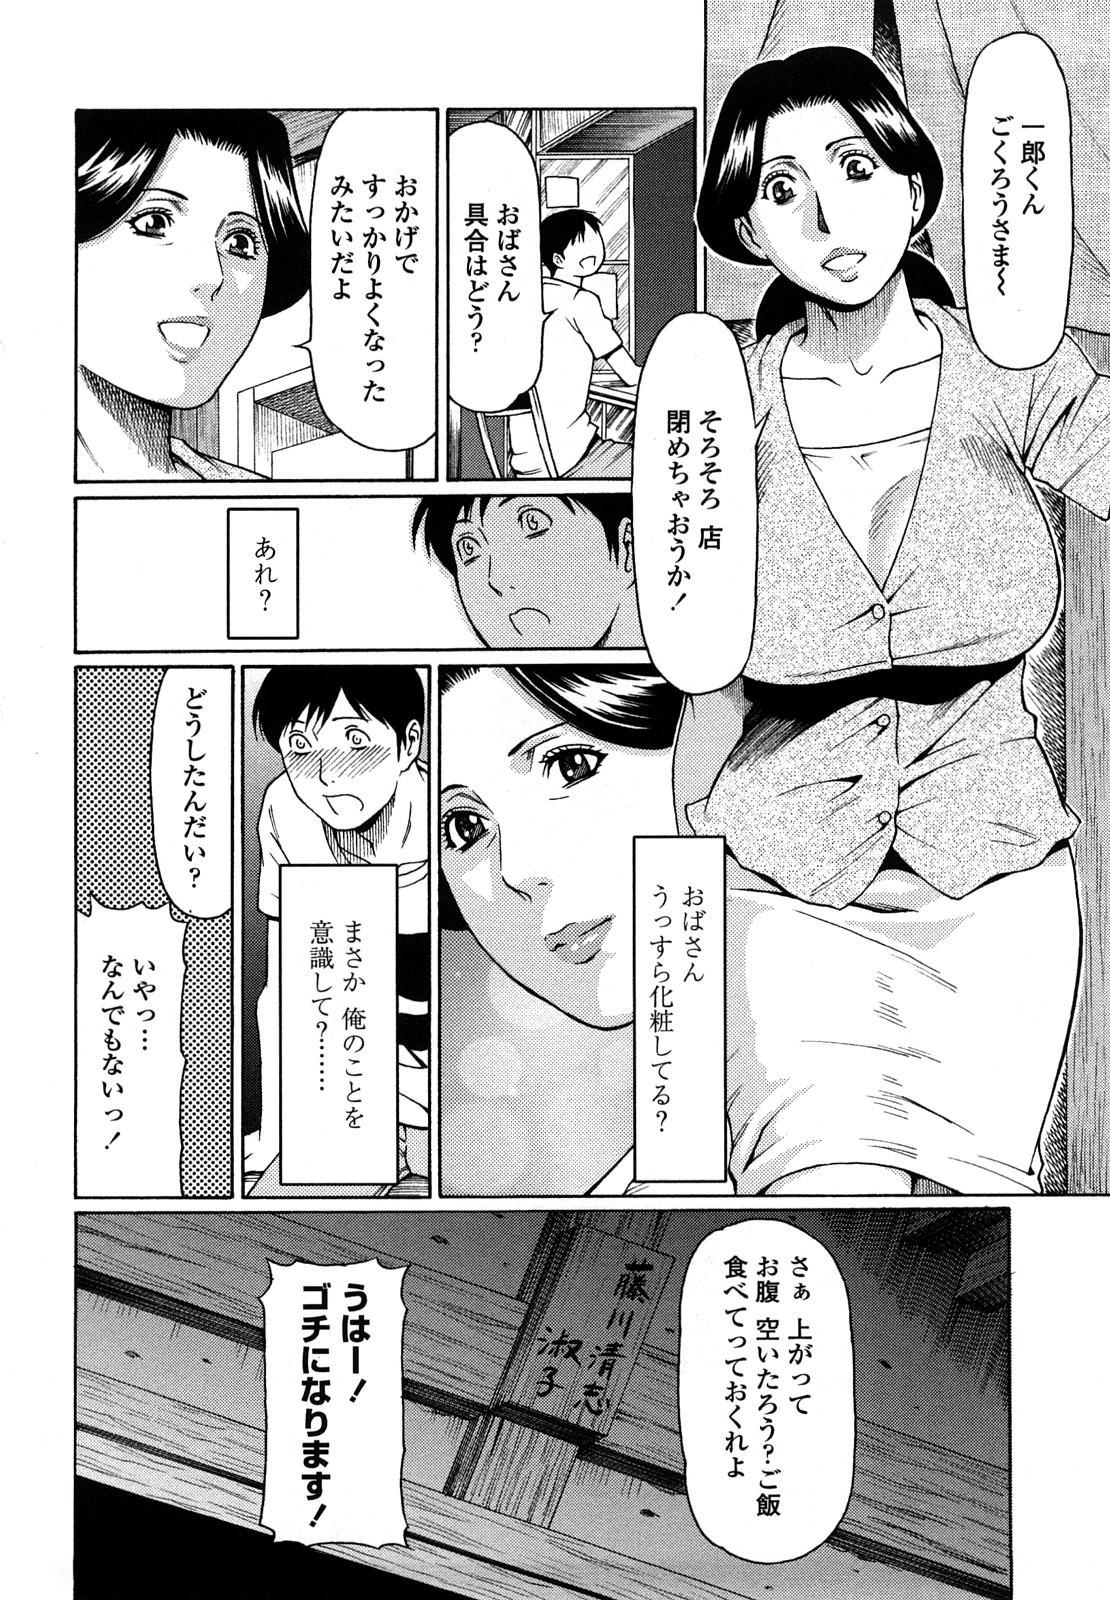 [Takasugi Kou] Kindan no Haha-Ana - Immorality Love-Hole [Decensored] 123